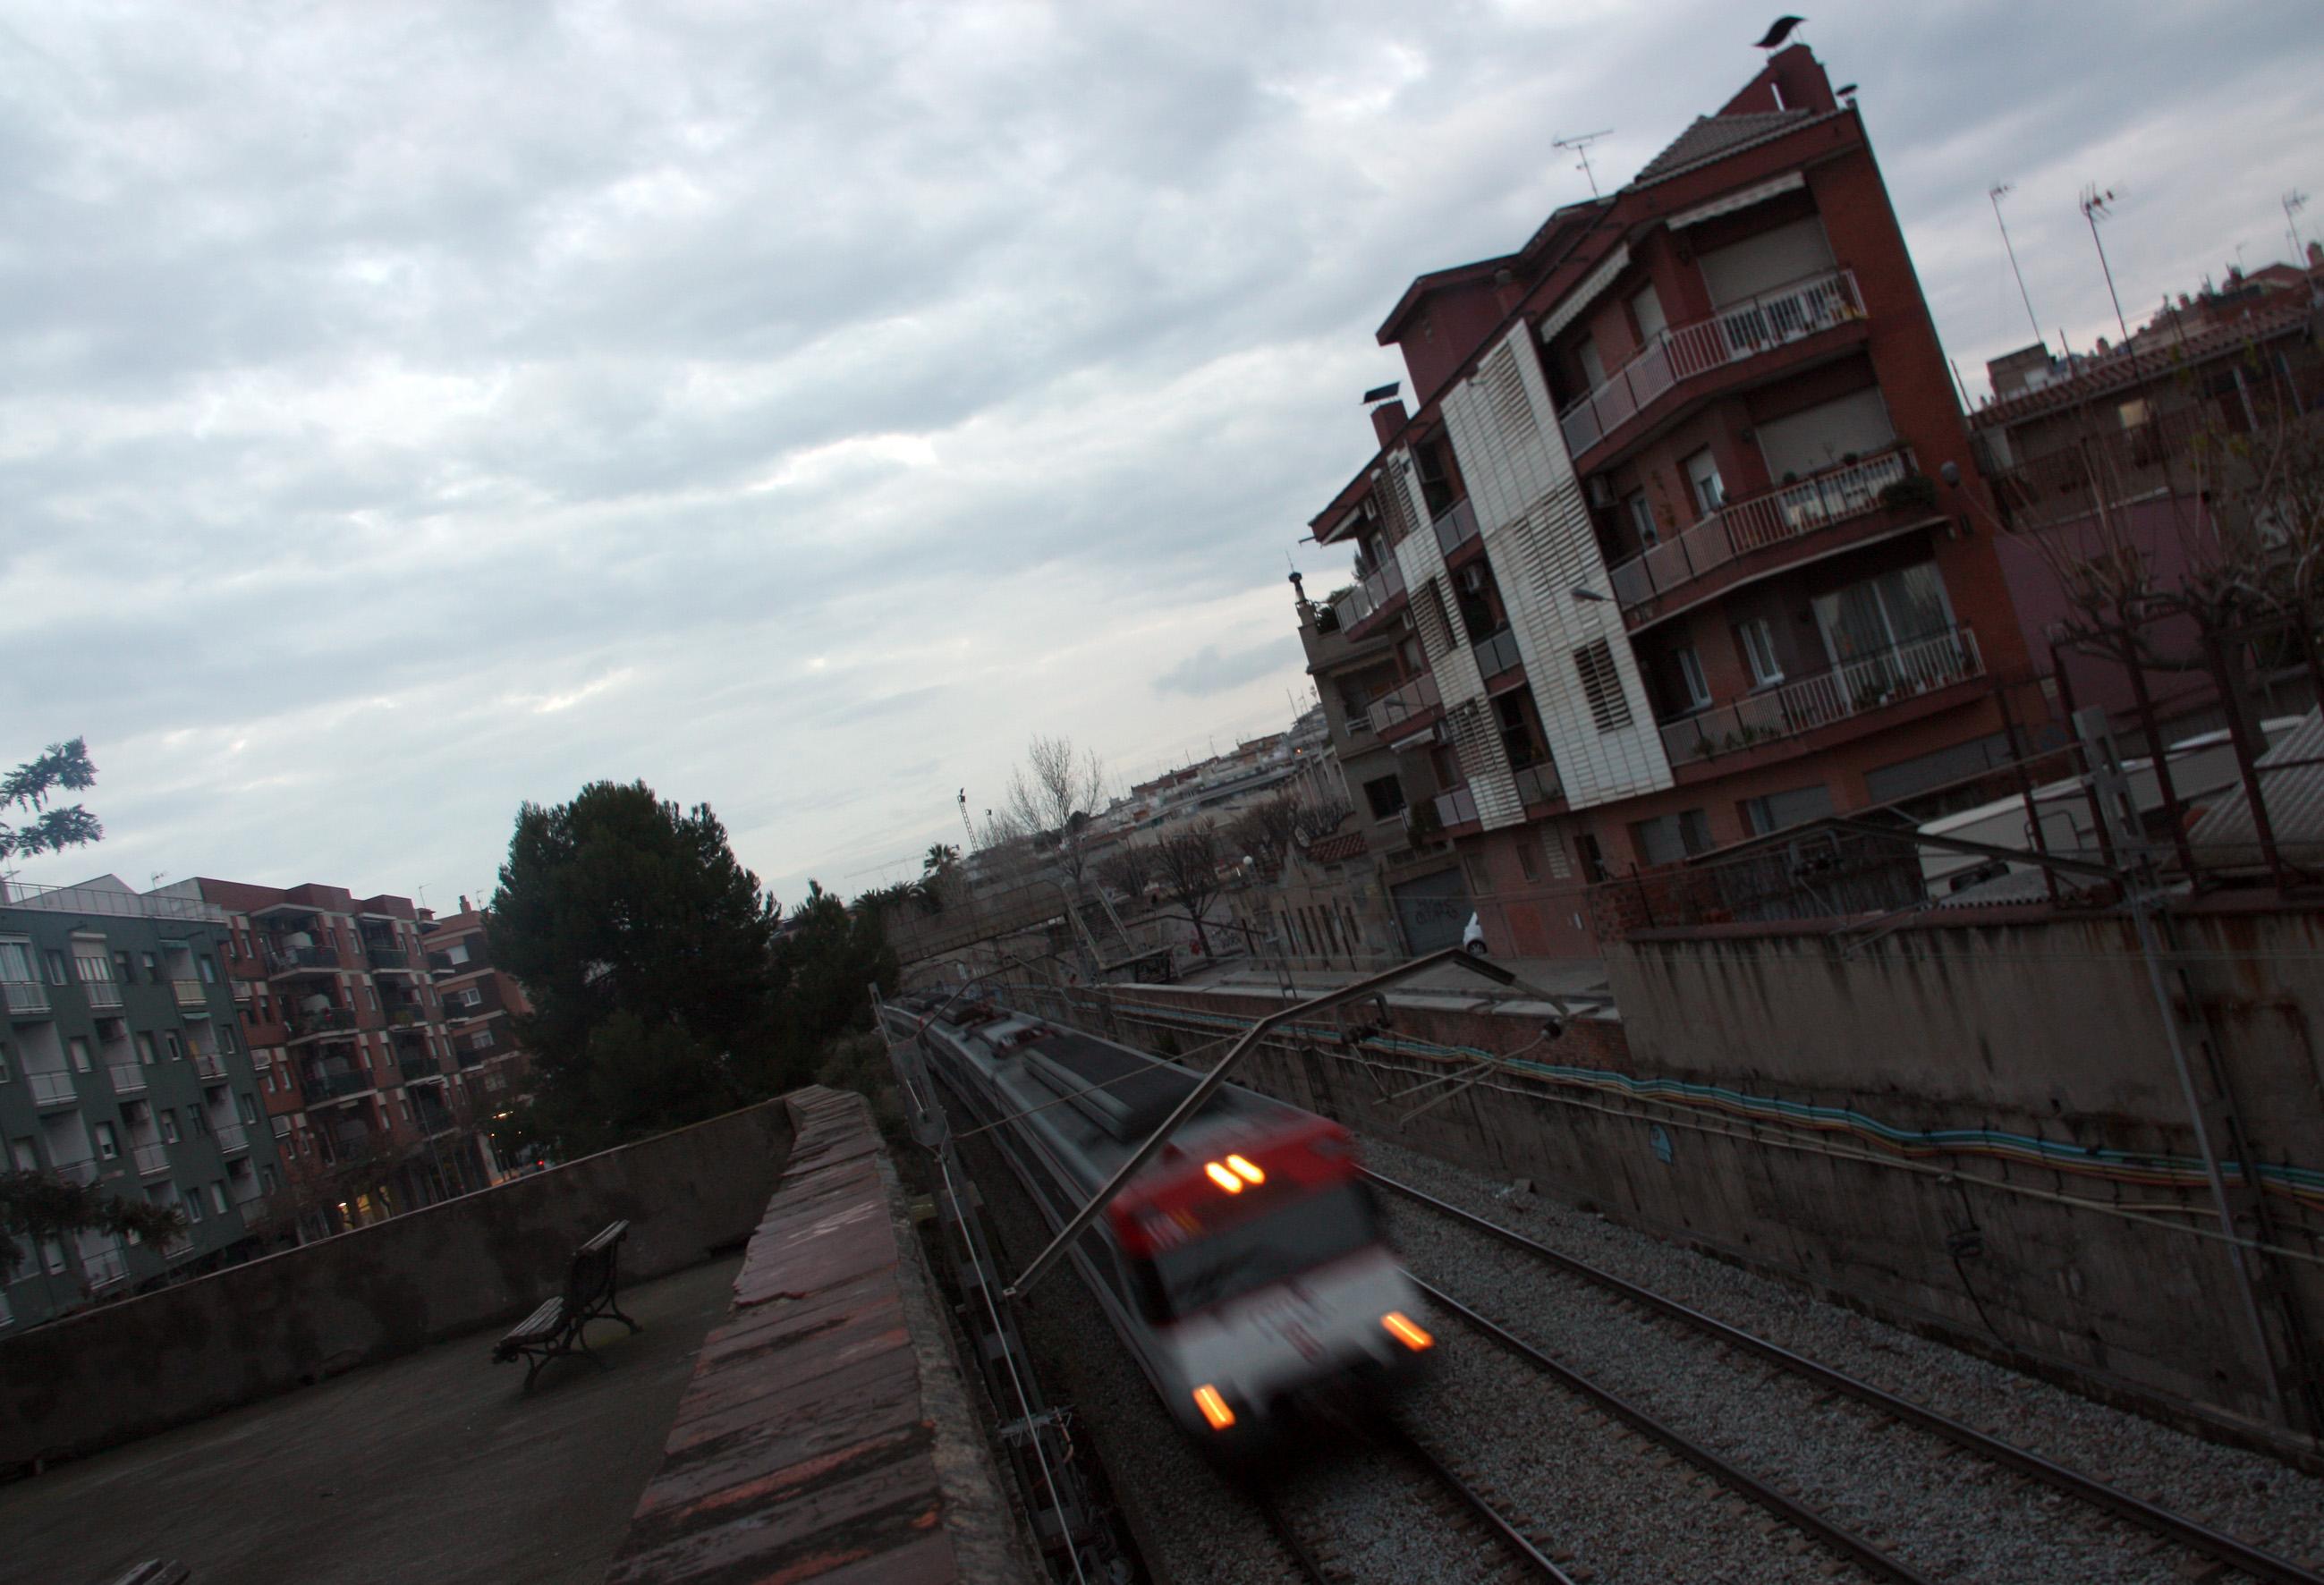 tren sant feliu